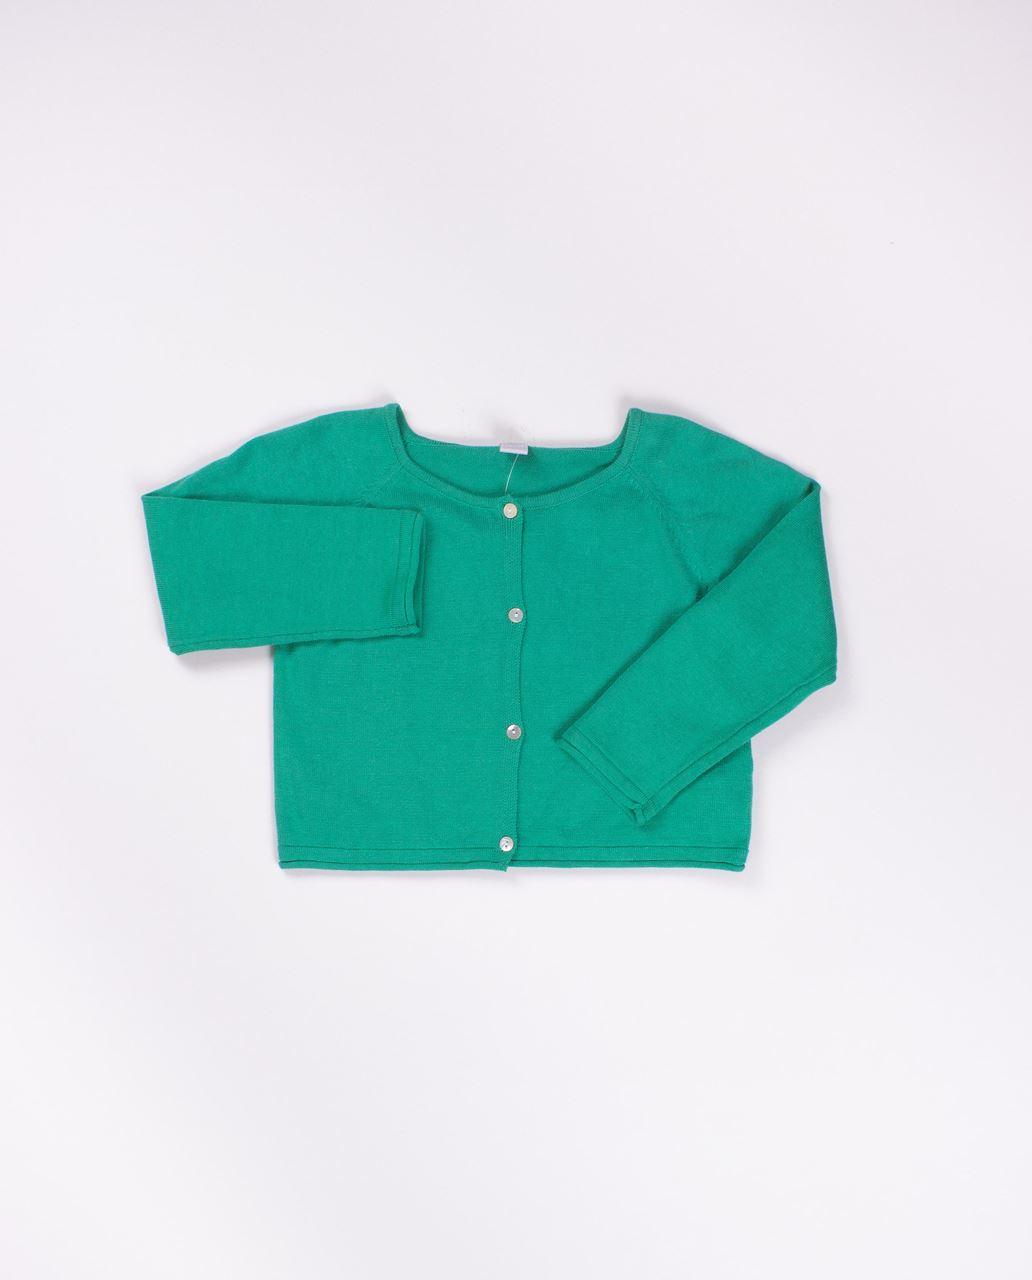 8537d57a6 Chaqueta niña algodon verde sandia. Dadati Profesionales